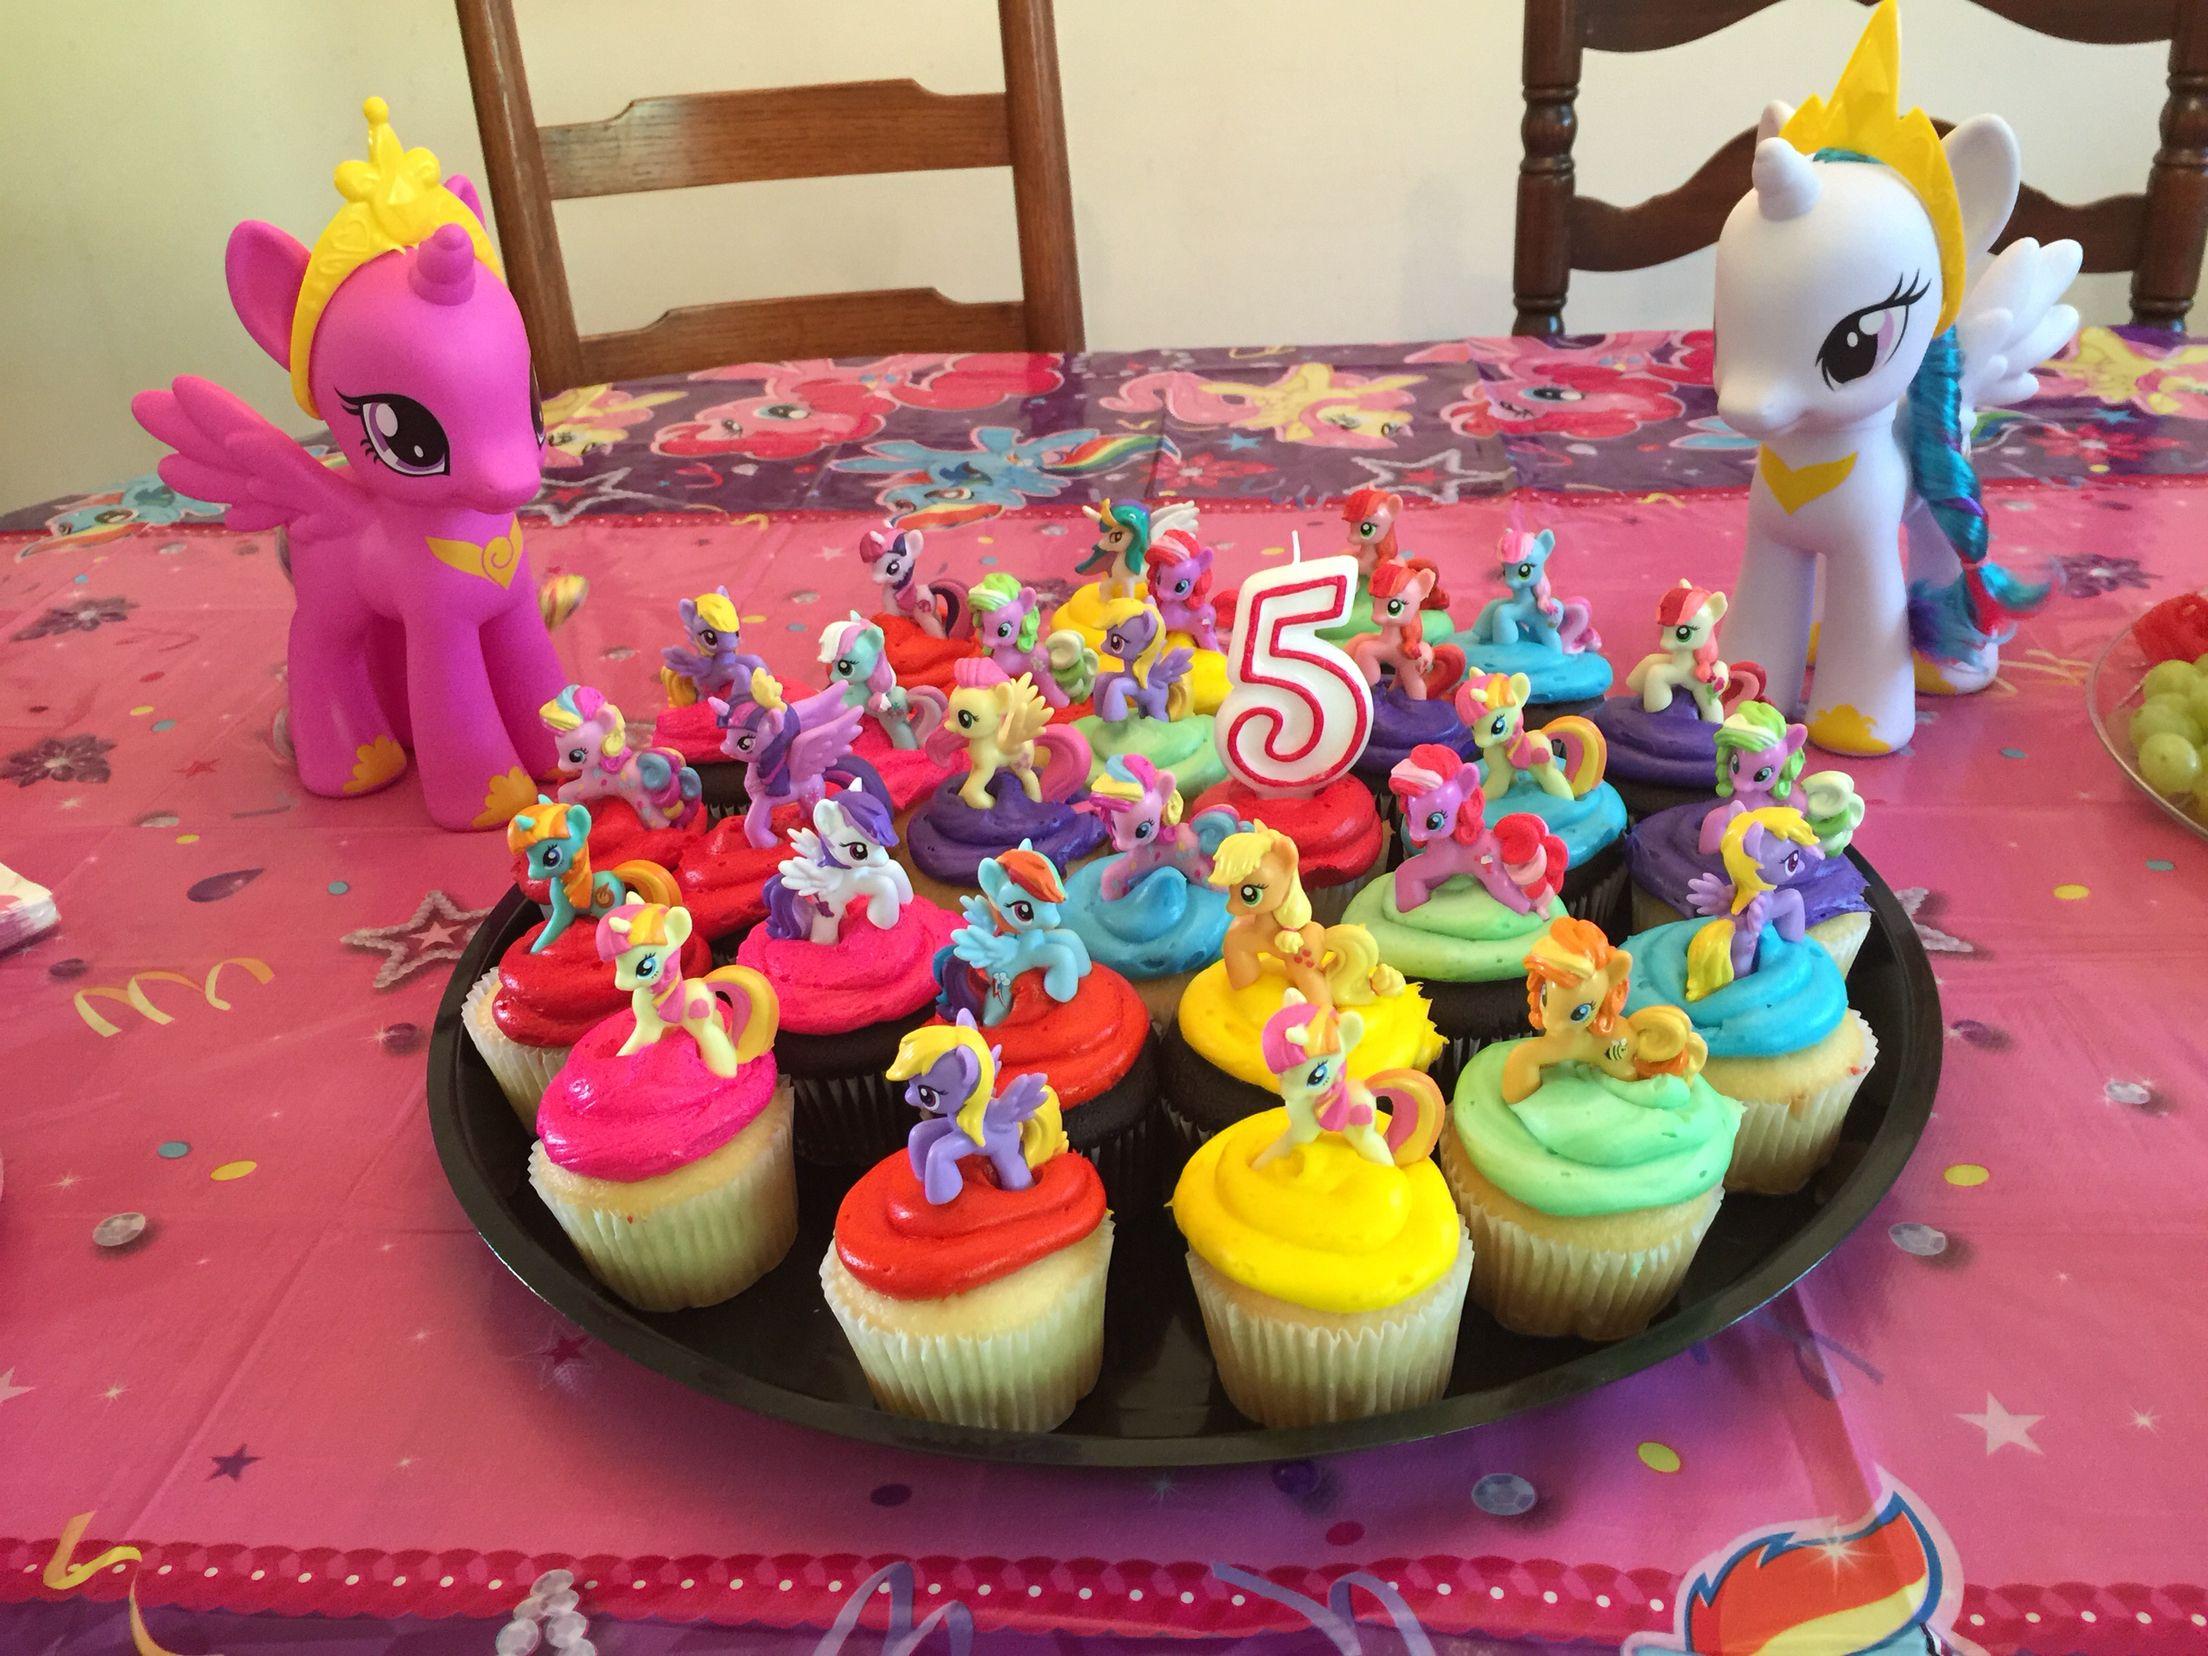 Lyrics My Little Pony cupcakes I had the cupcakes made at Kroger